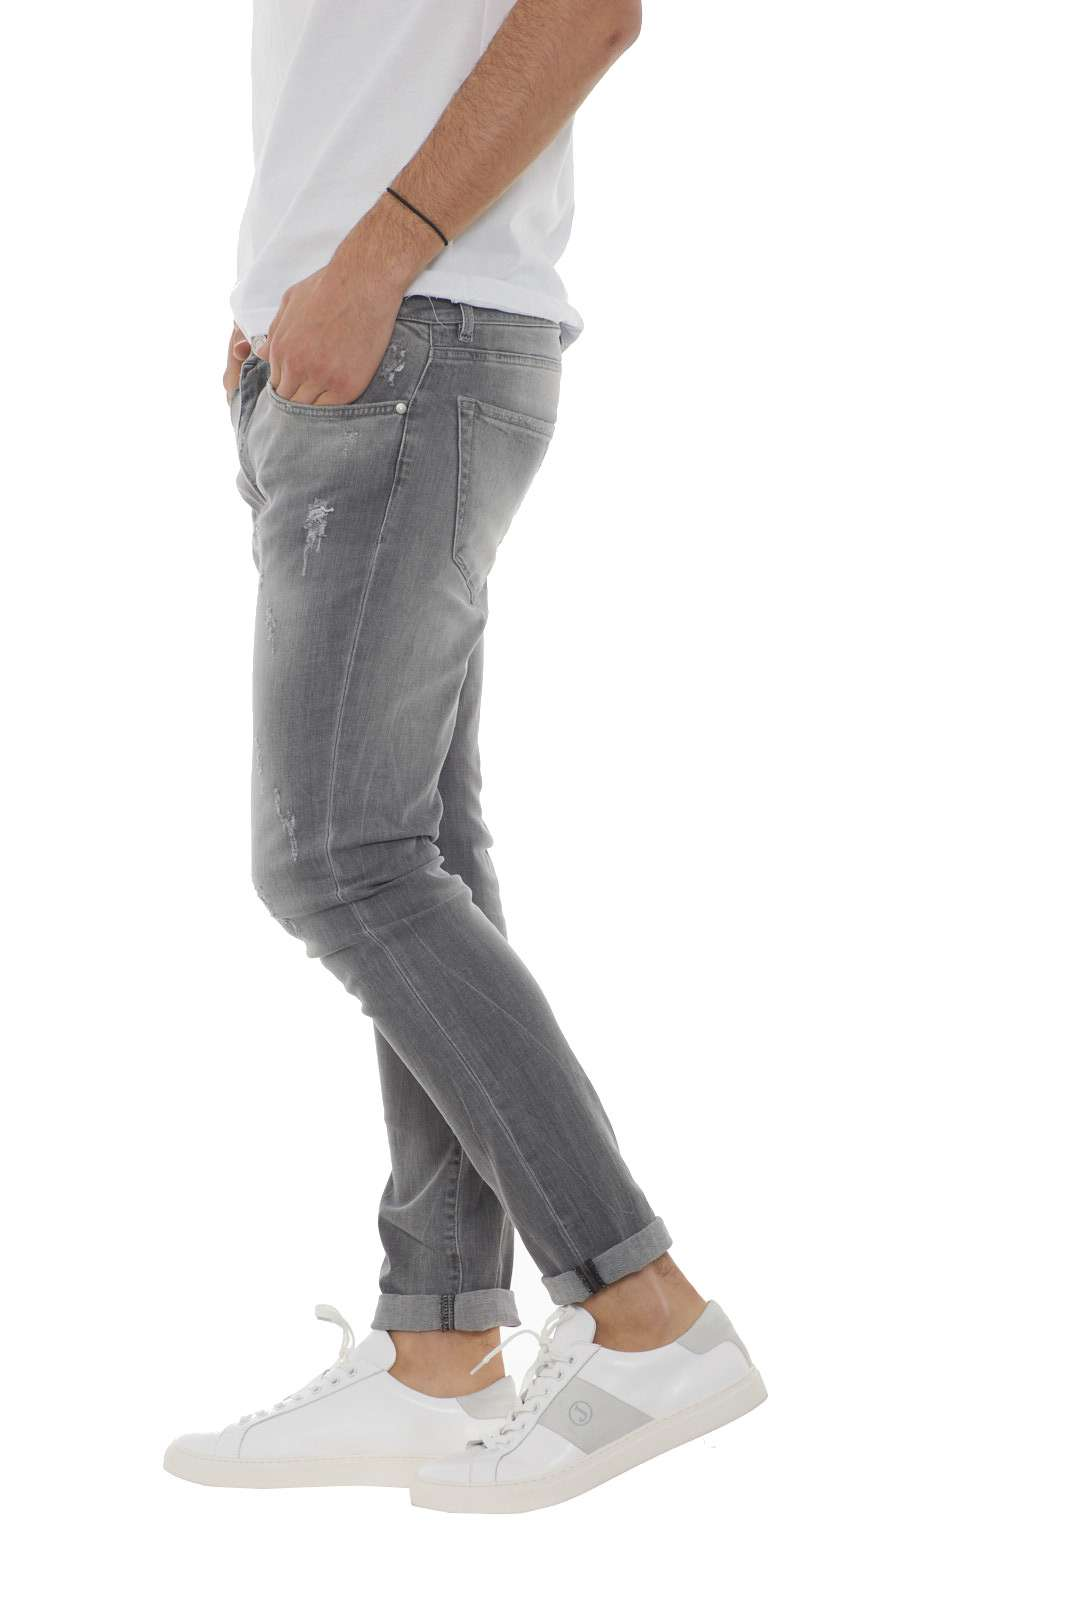 /media/catalog/product/a/i/PE-outlet_parmax-denim-uomo-Clink-Jeans-London-MARTIN-B.jpg